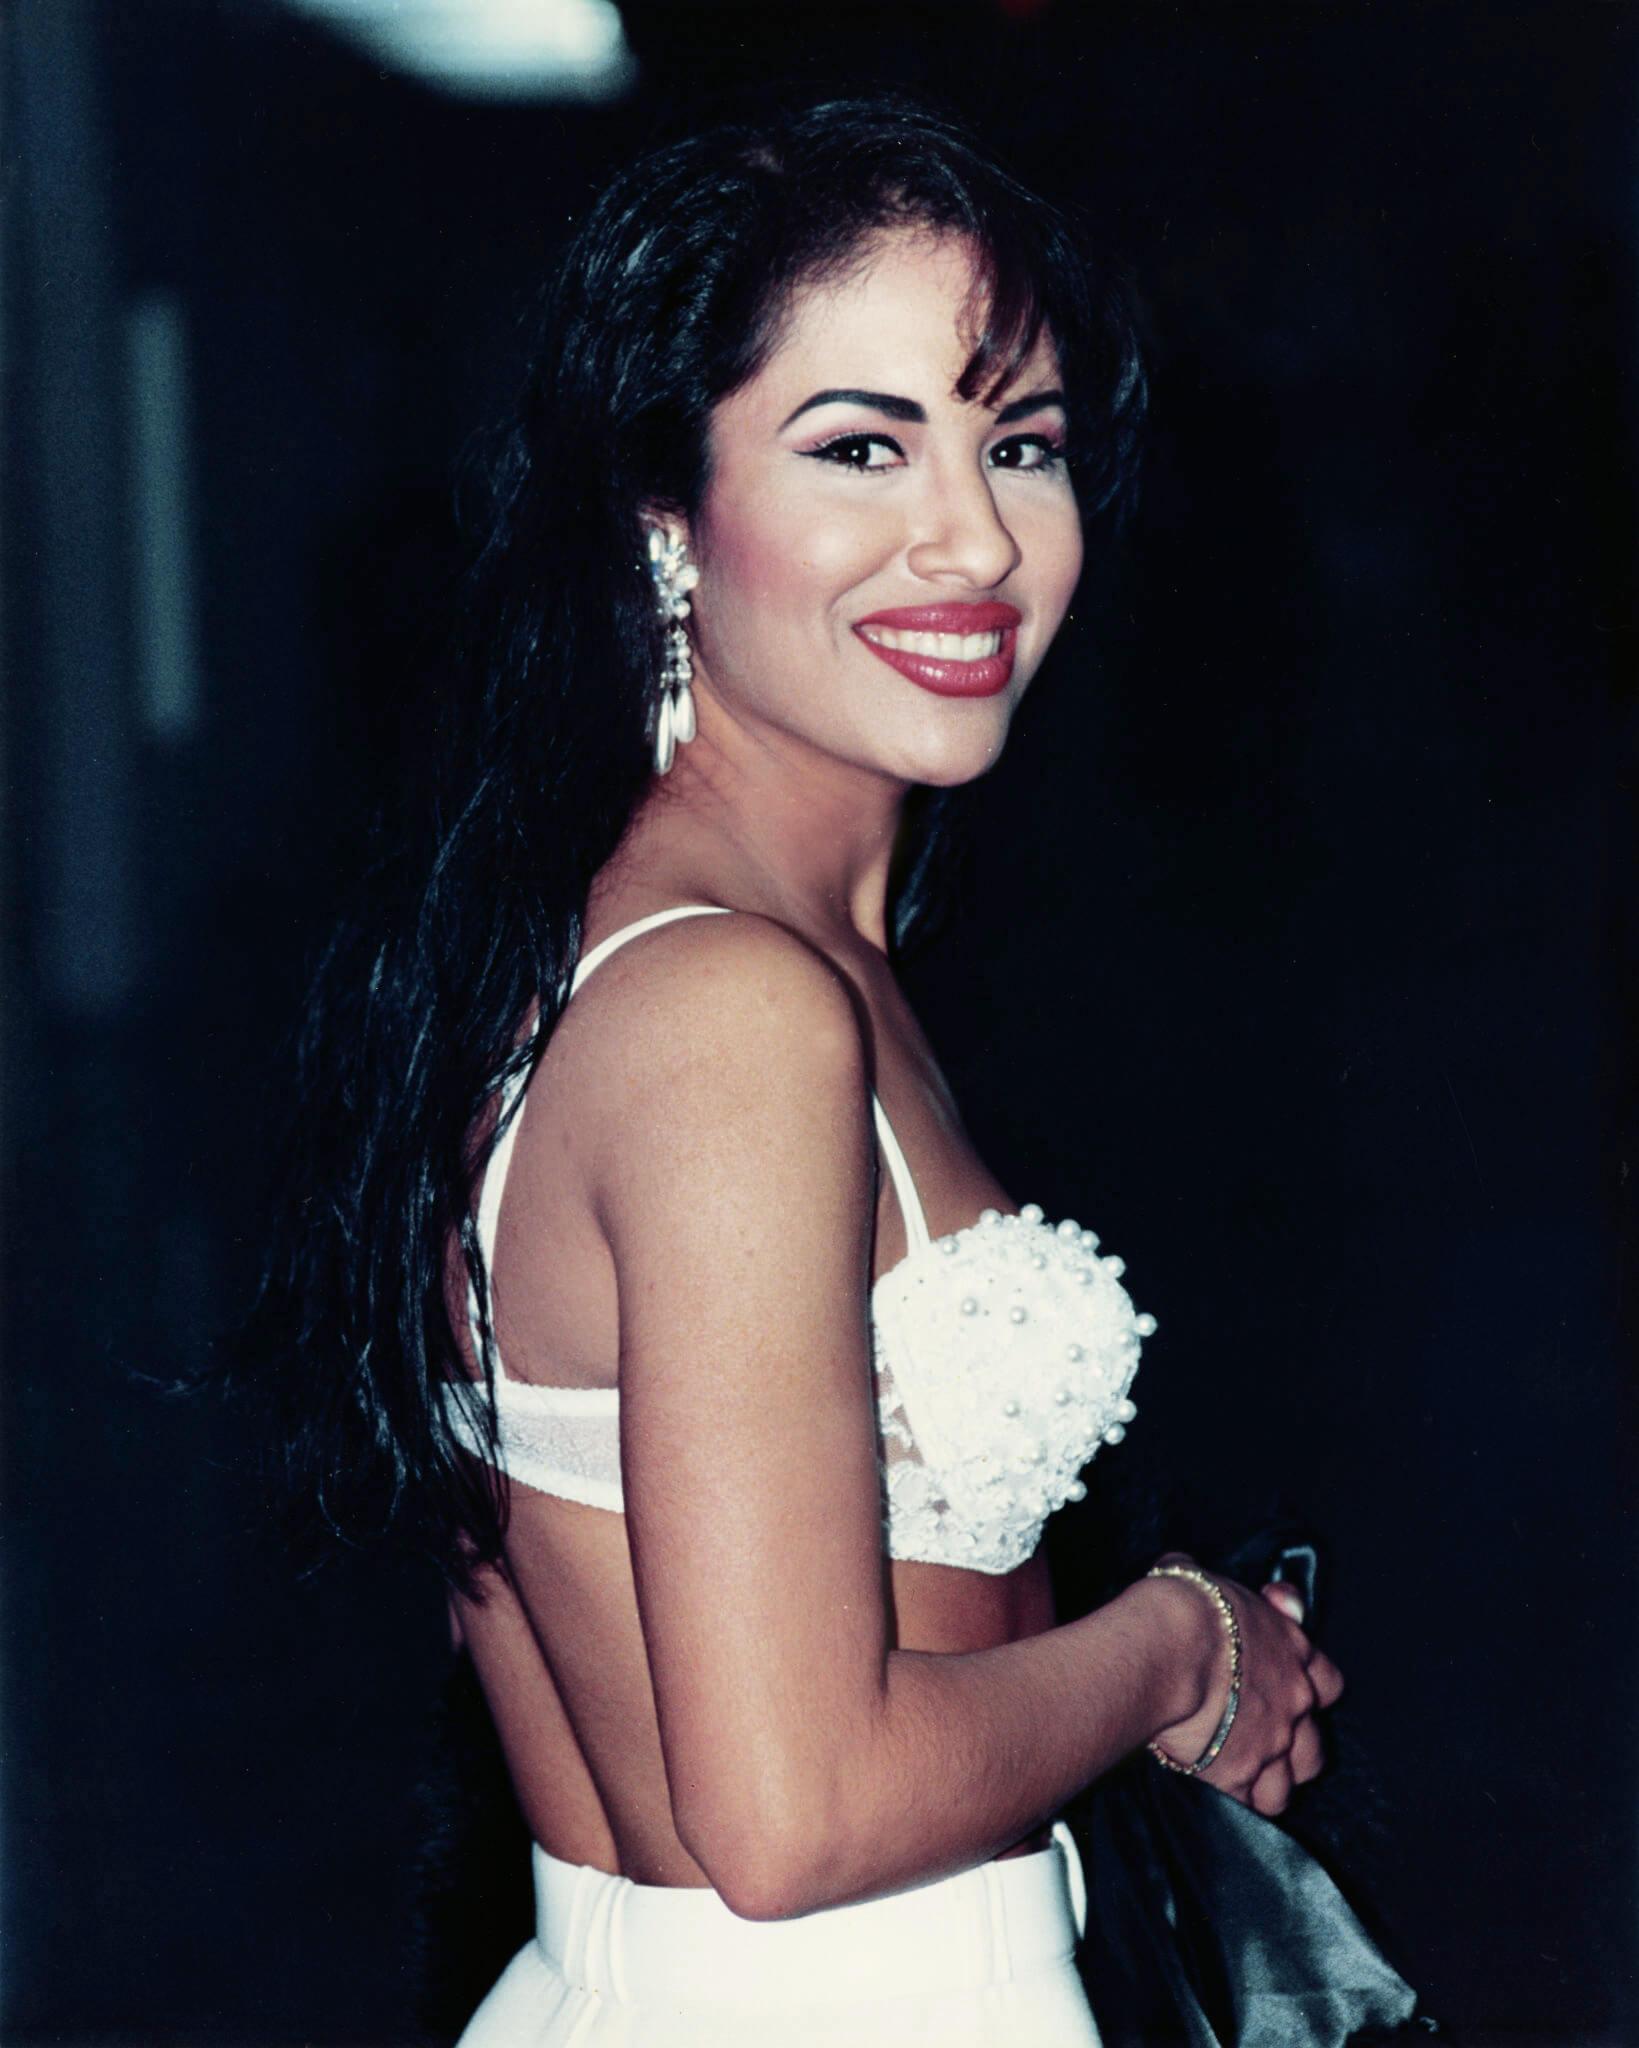 La historia de Selena Quintanilla llegará a Netflix en una nueva serie